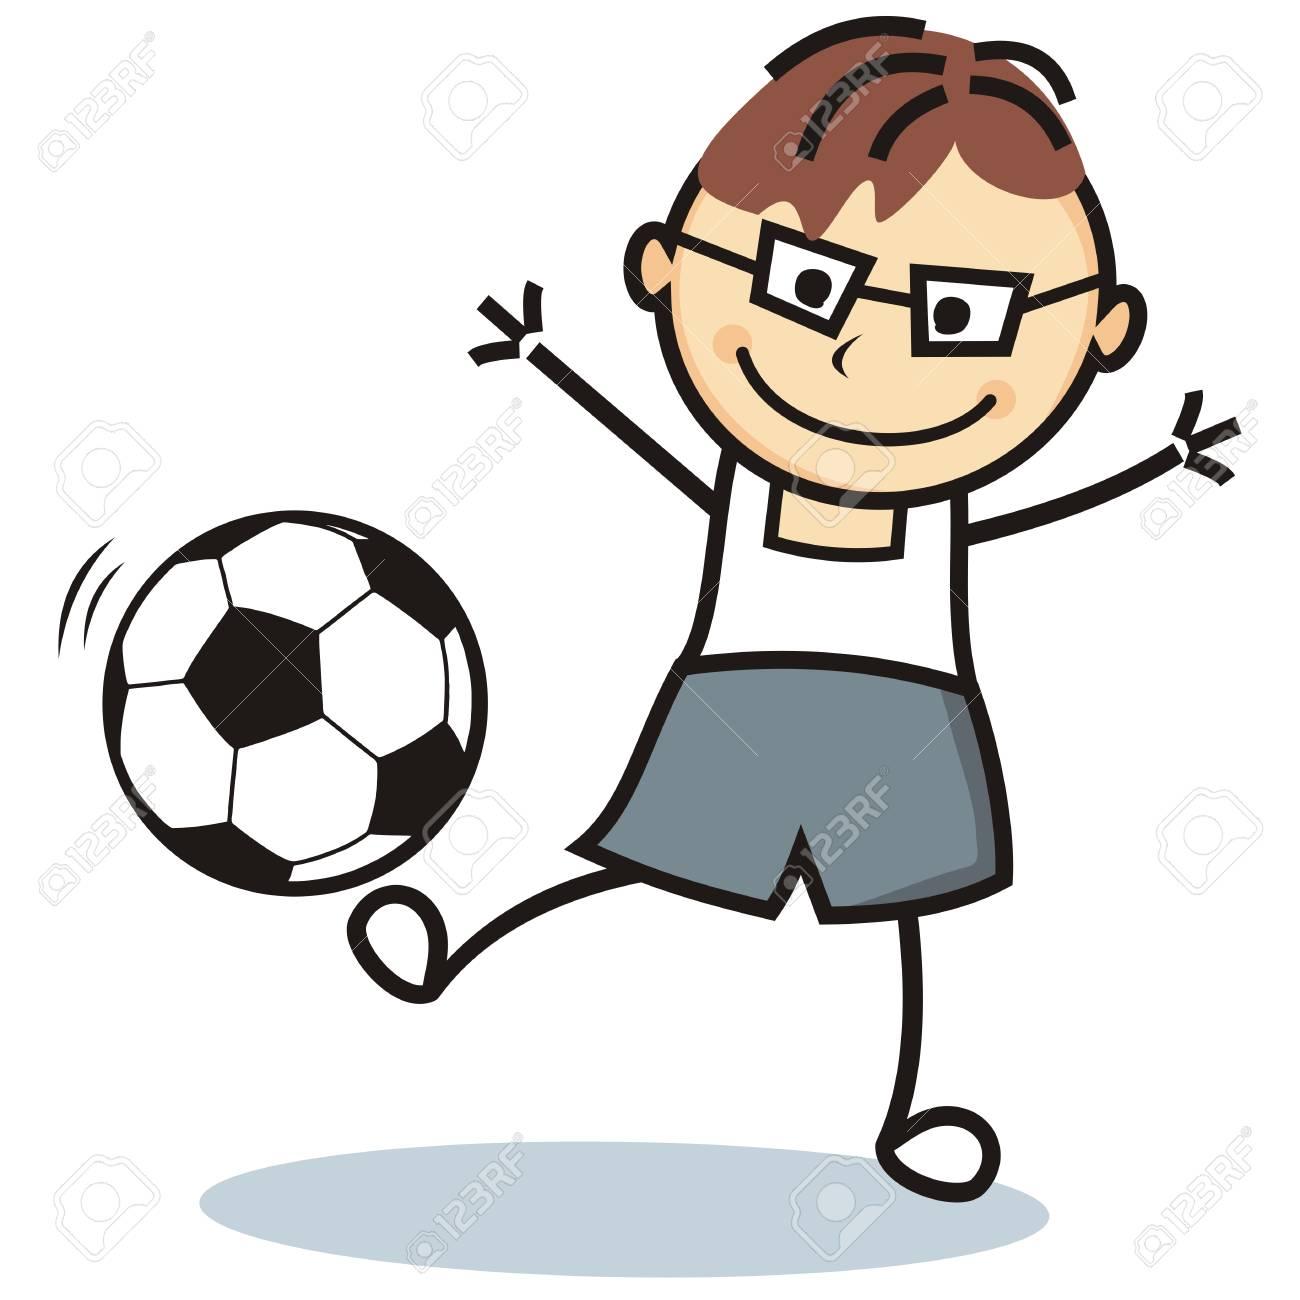 Football player, soccer ball, vector icon, funny illustration.